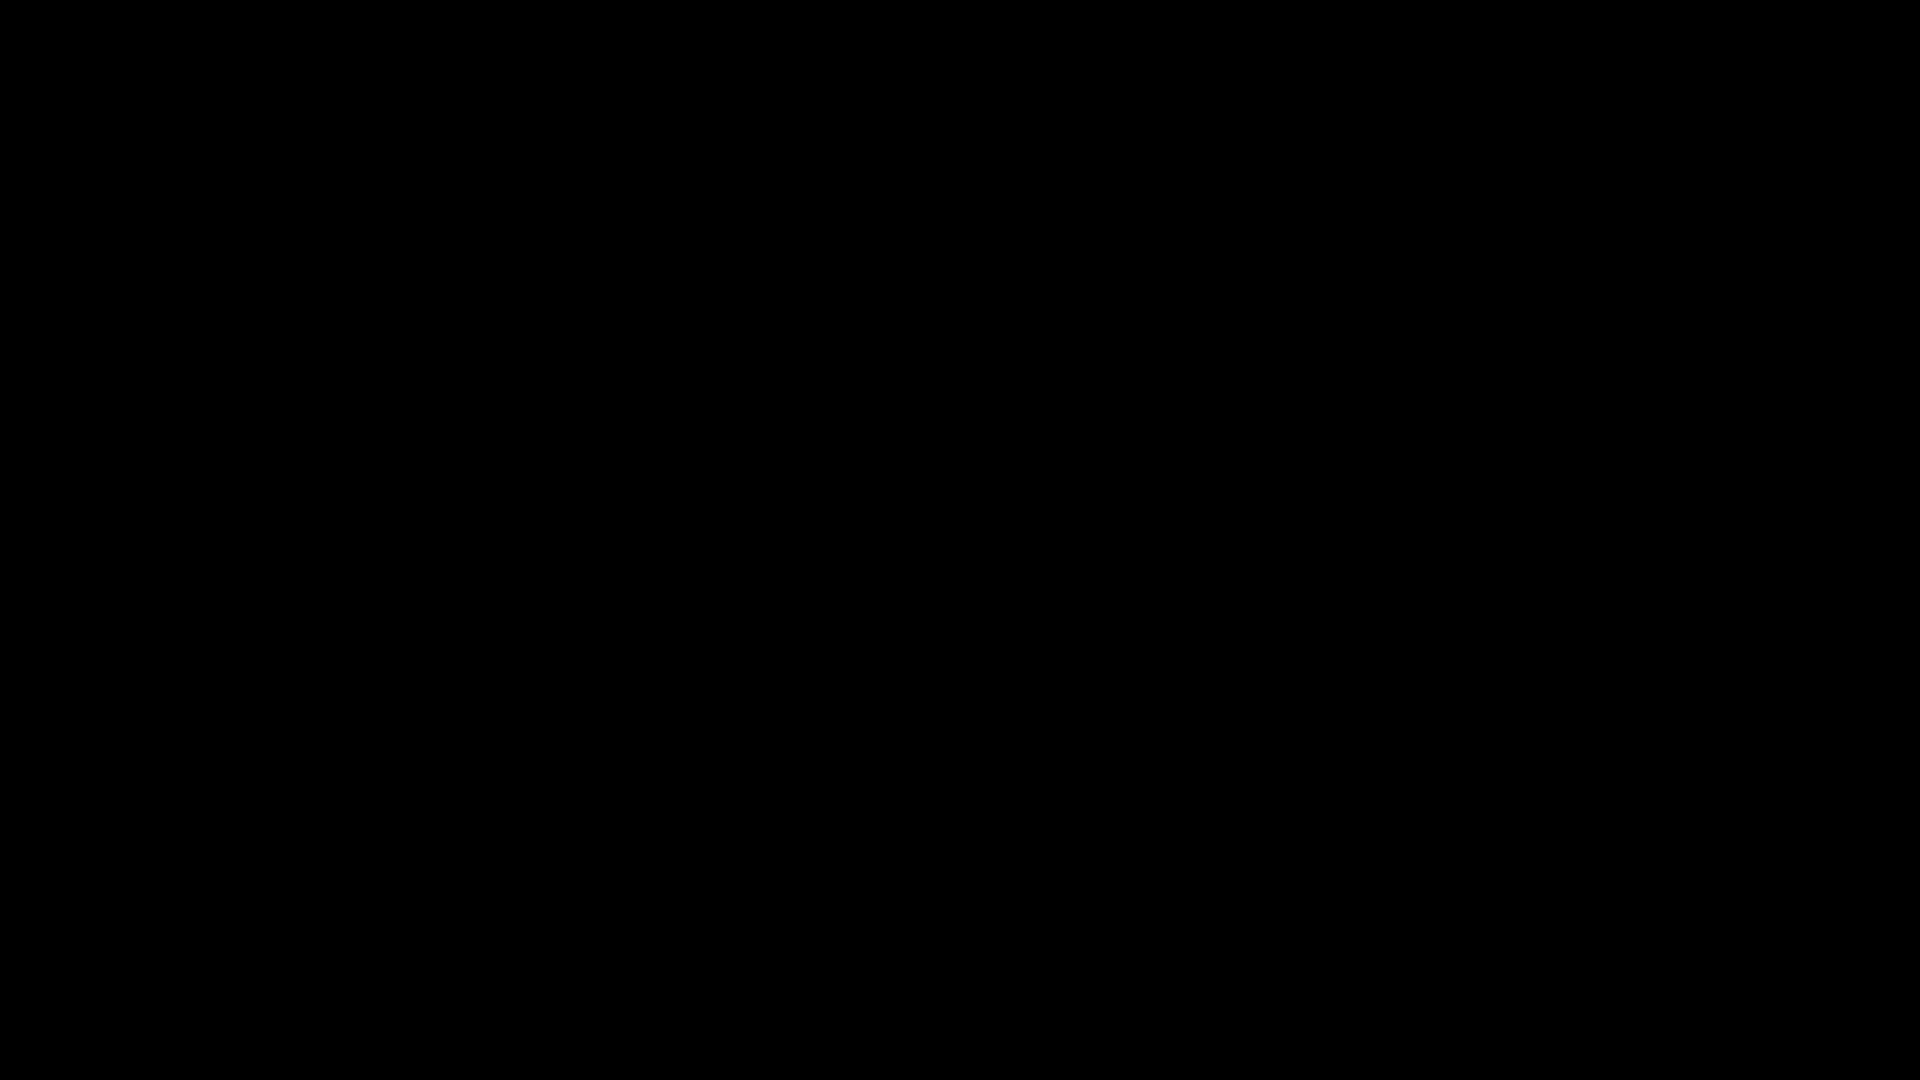 planetside, ps2cobalt,  GIFs